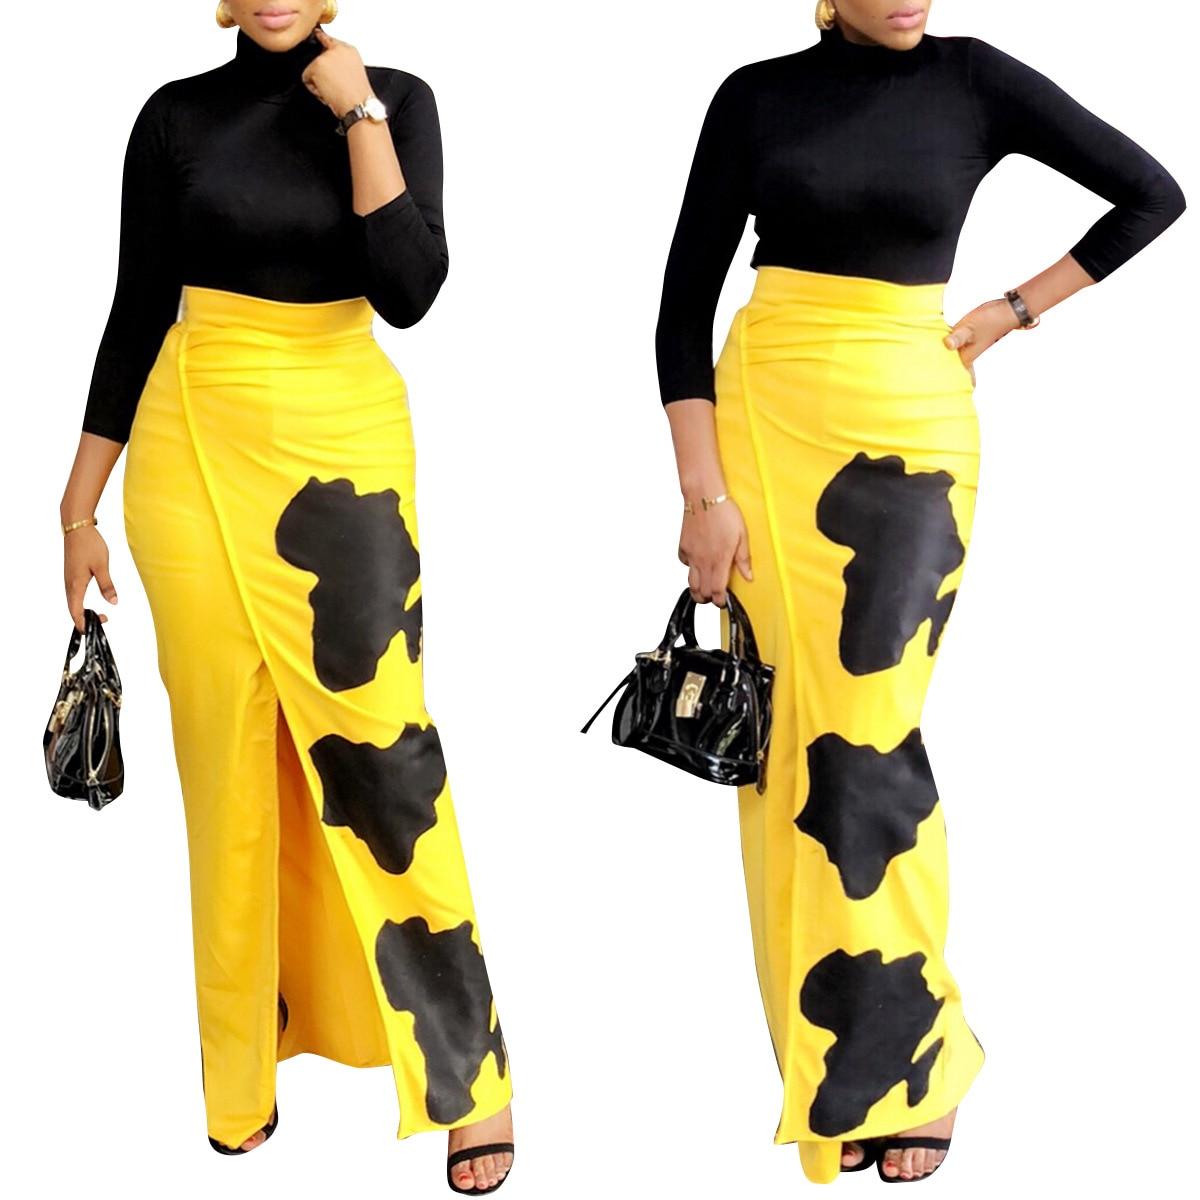 2019 Fashion African Women Skirt Summer Skirts Digital Printing Floor-Length Elegant Vestidos High Waist Vintage Skirts